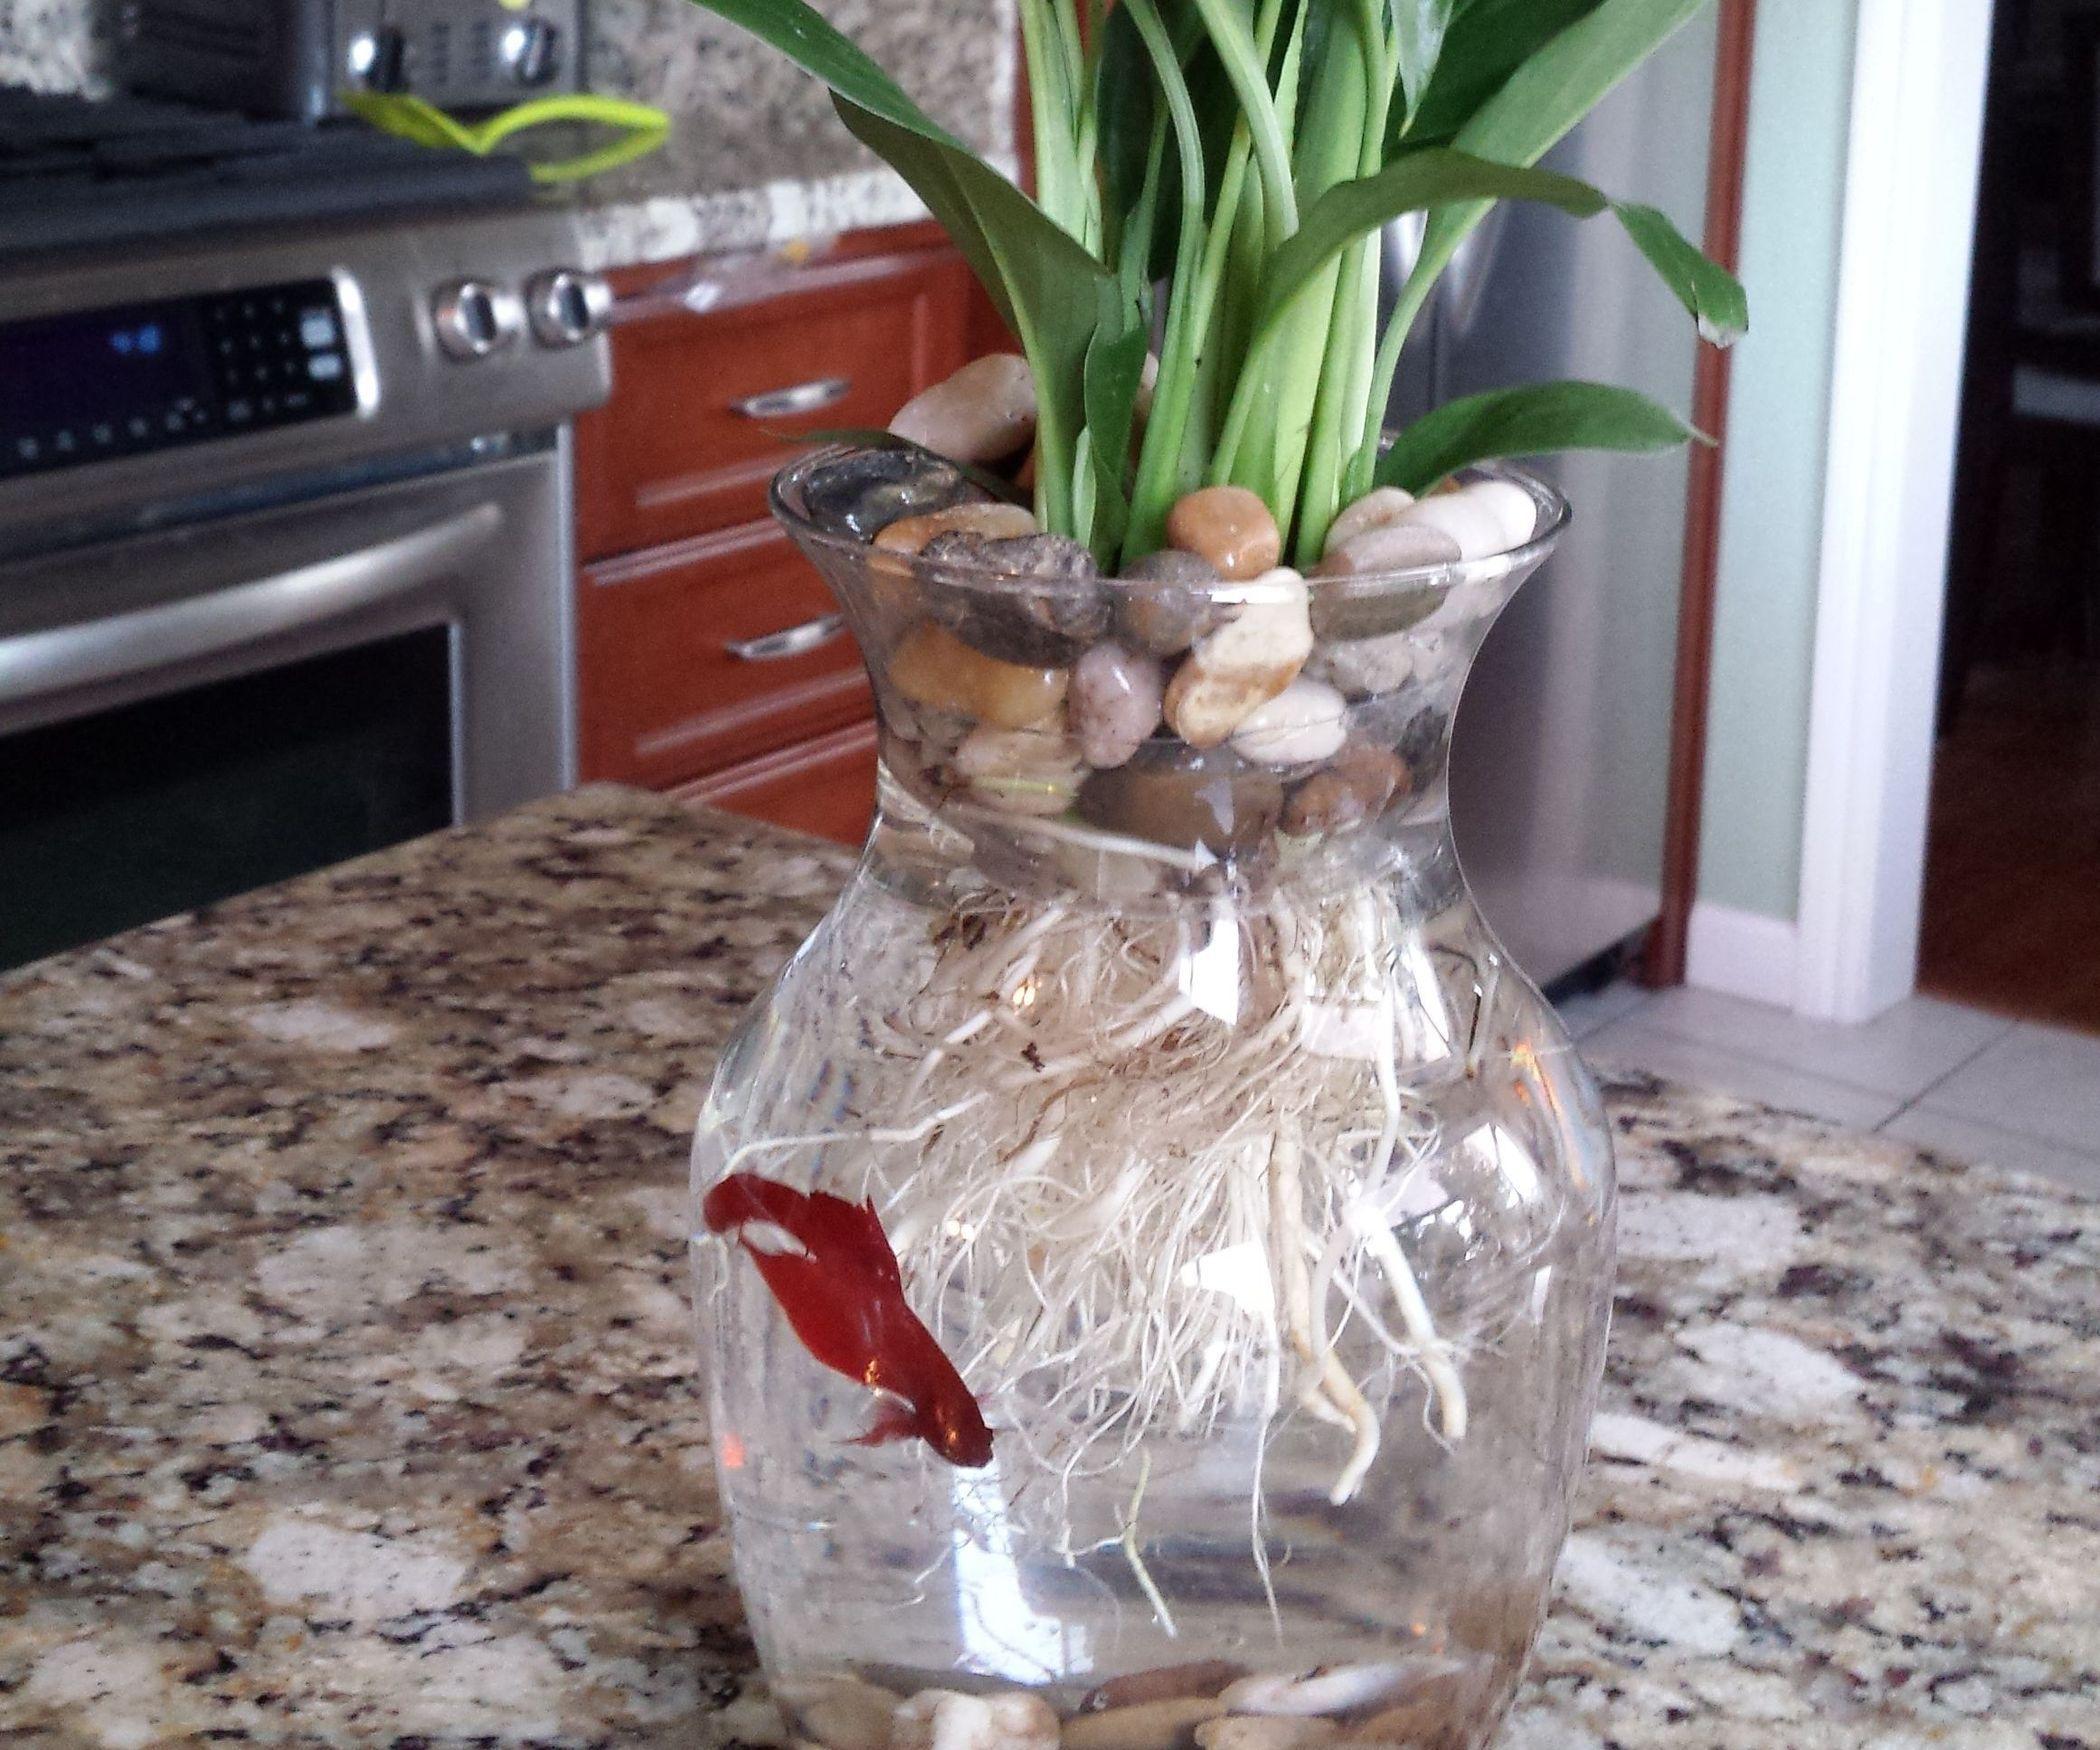 $8 Betta Fish & Flower Vase   Super simple, Betta and Betta fish